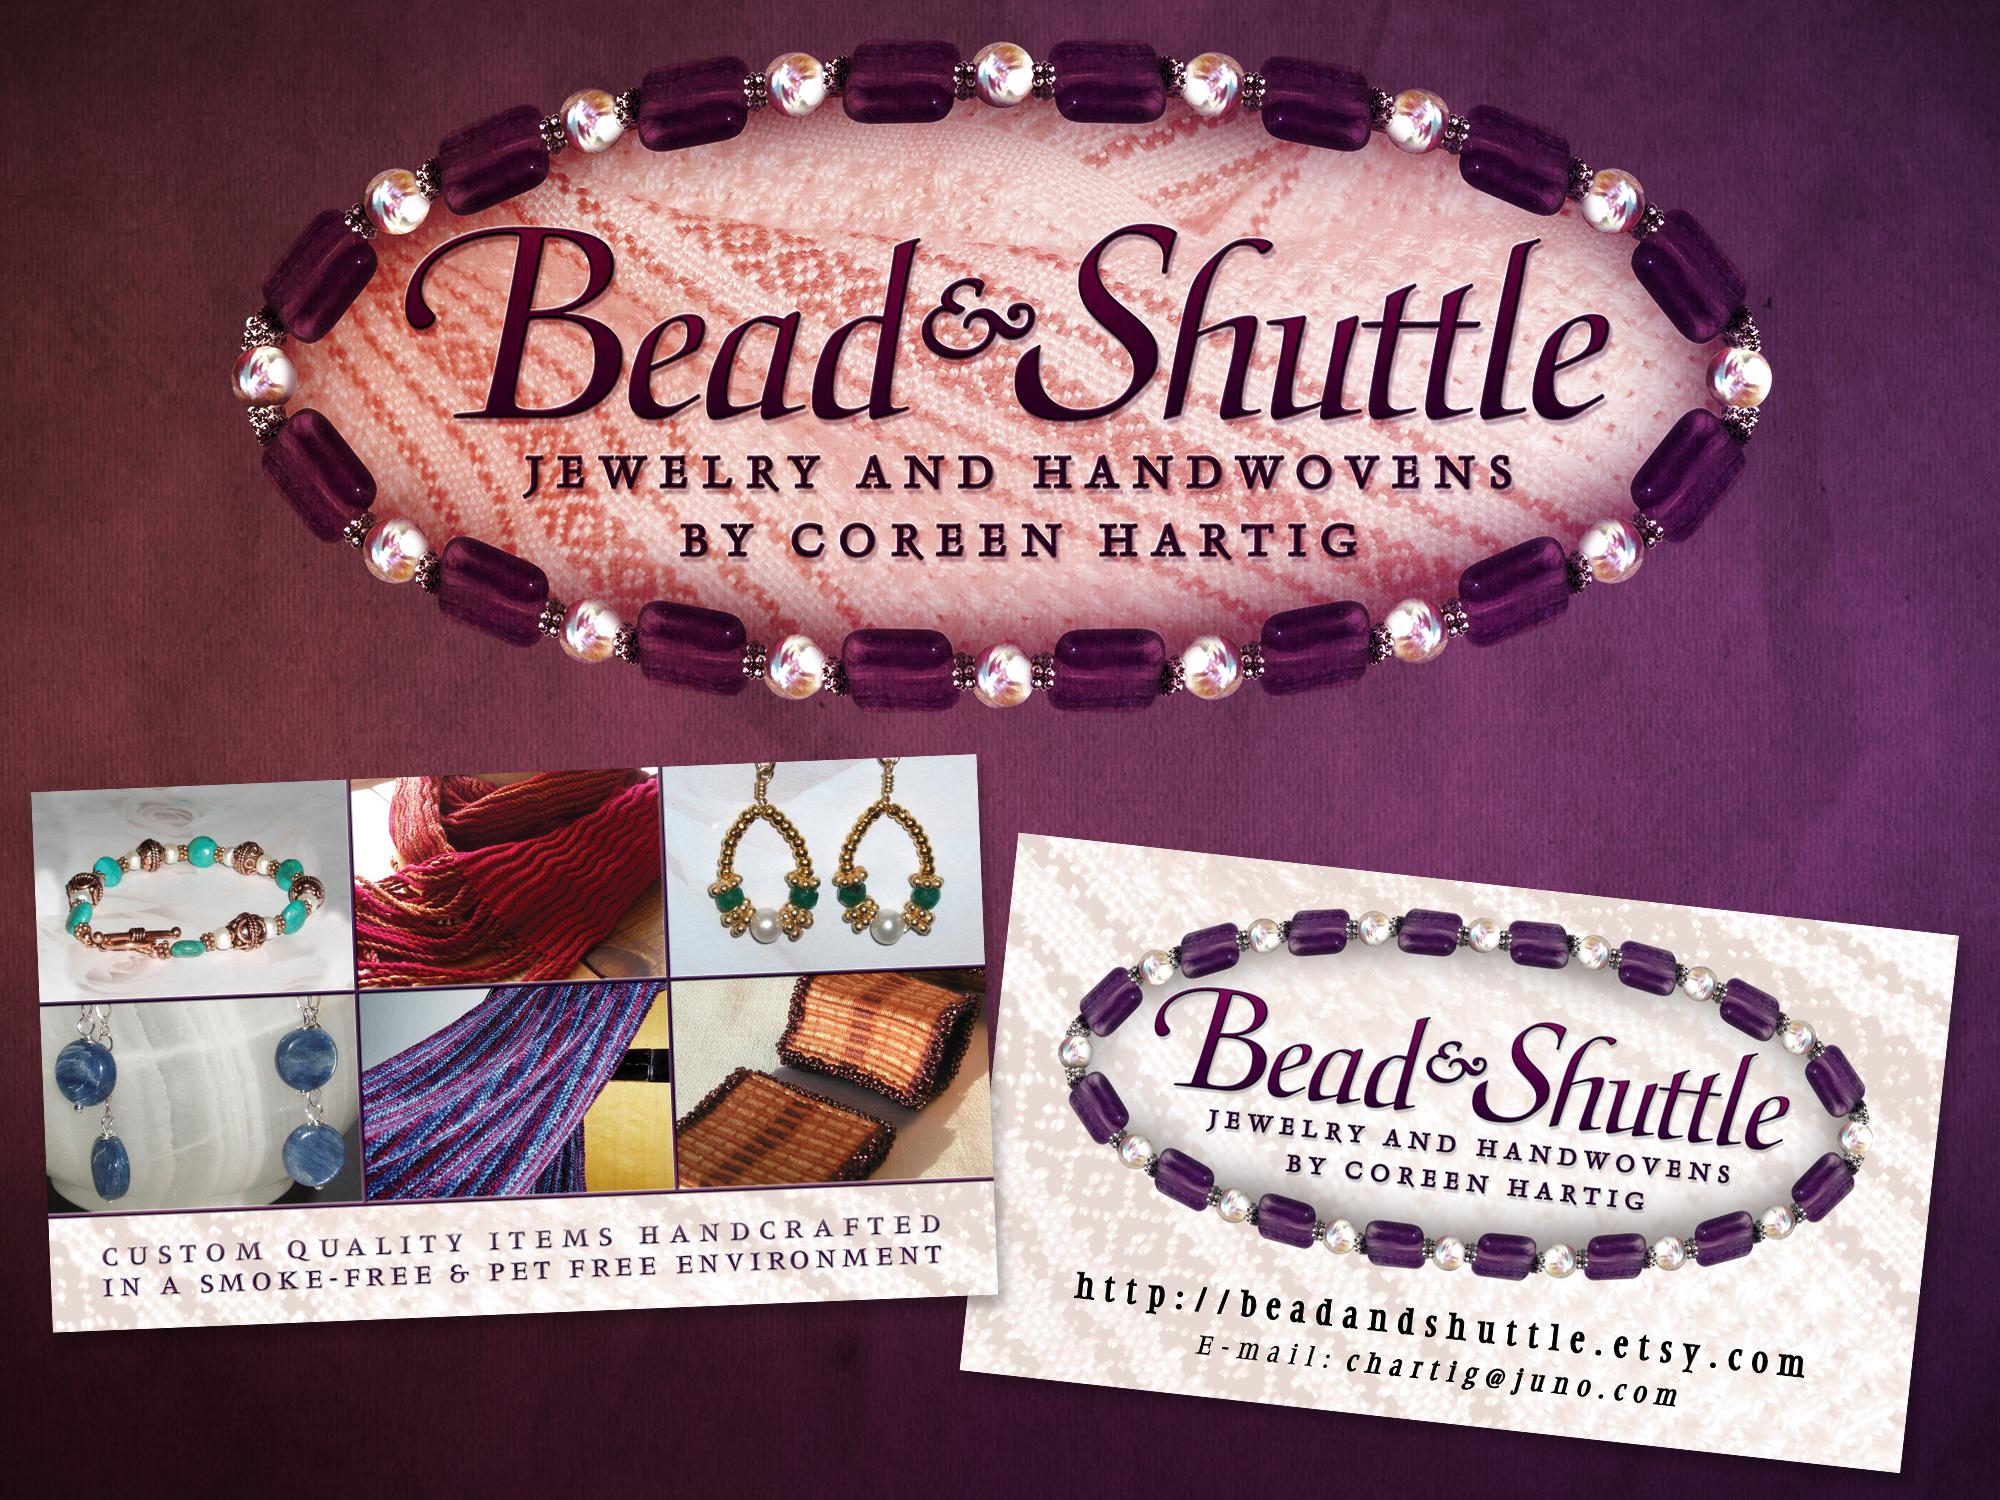 Bead & Shuttle